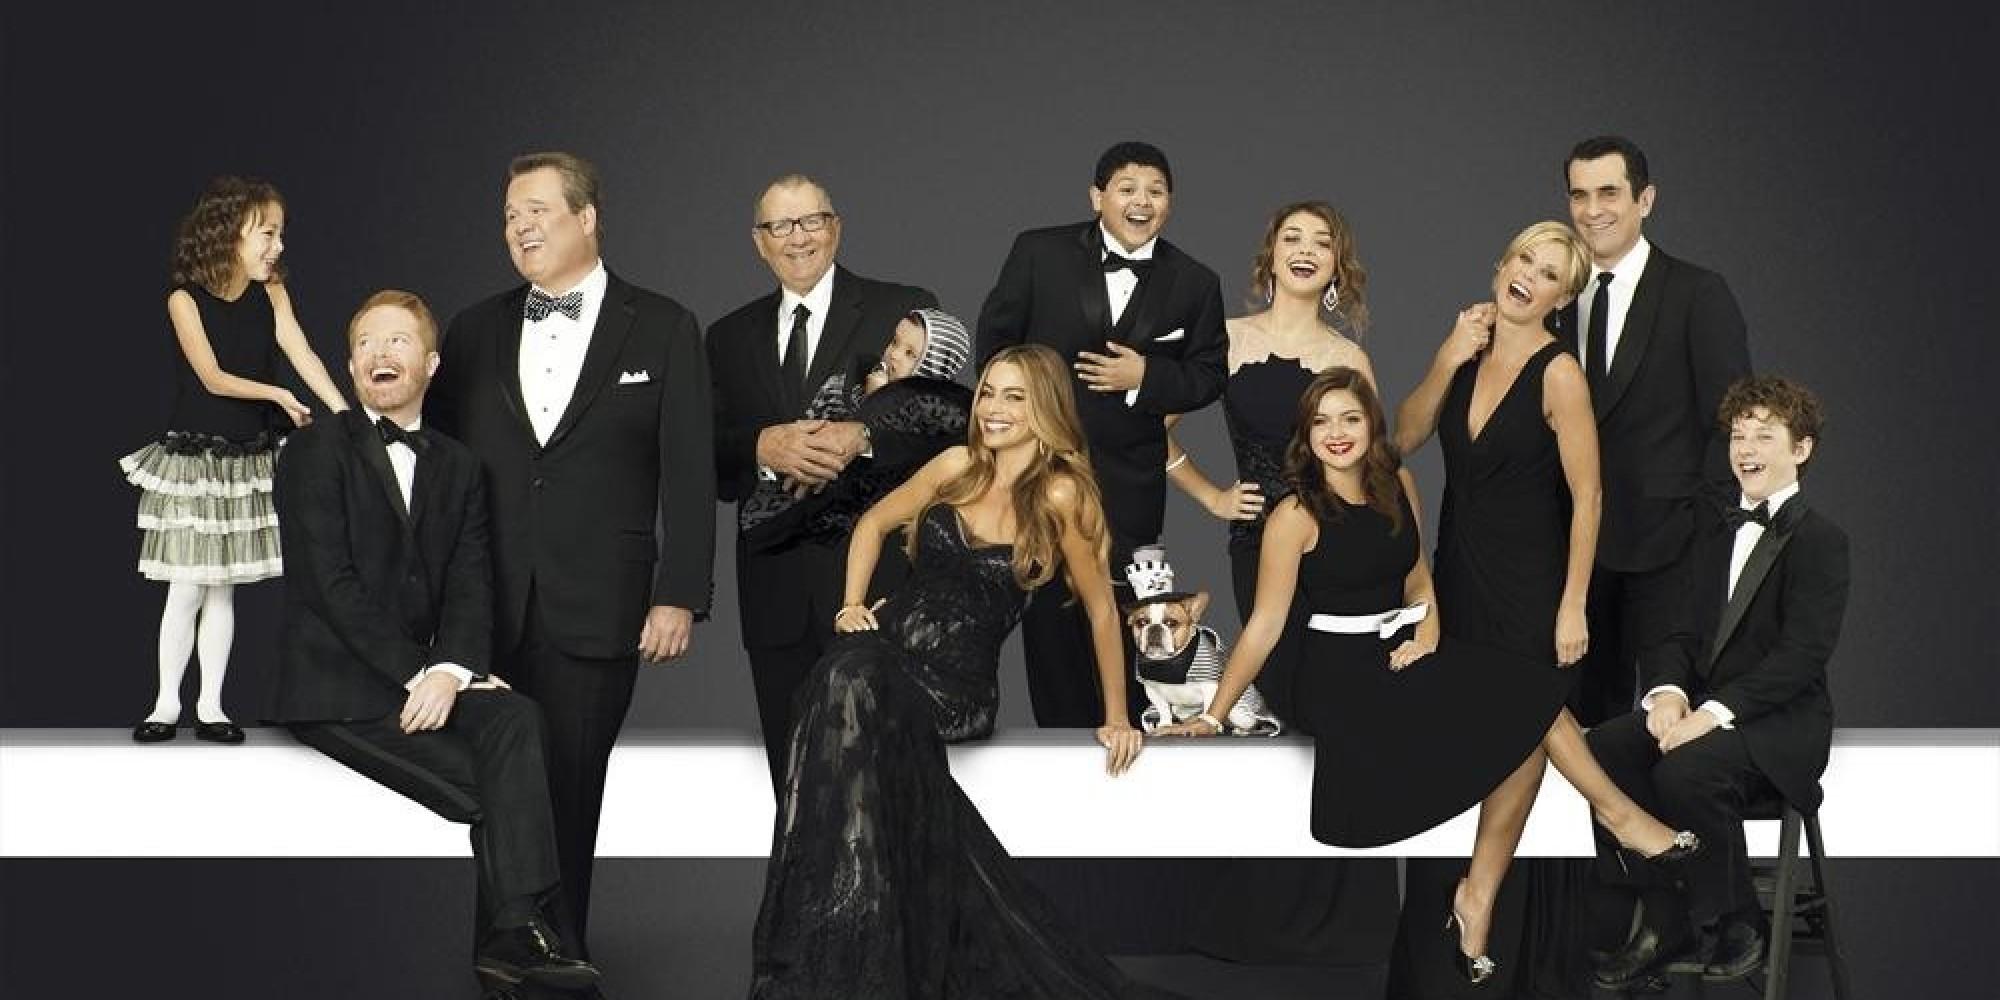 Modern Family|S05|1080p|x265|Dual Latino|Parte1